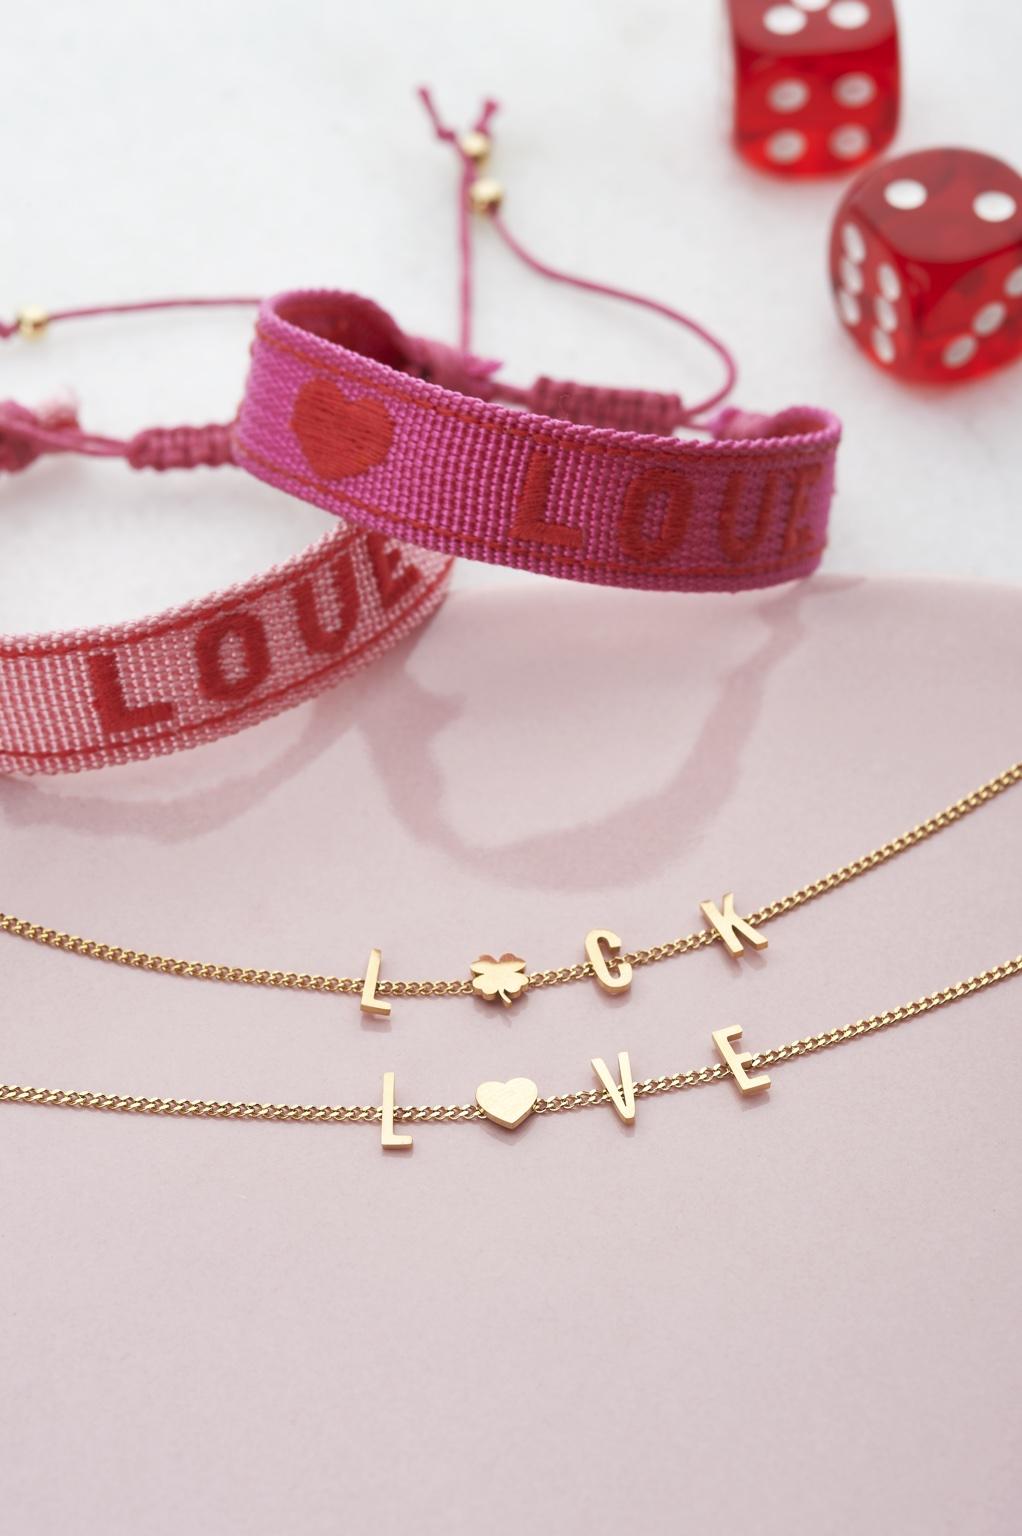 My Jewellery - my-12